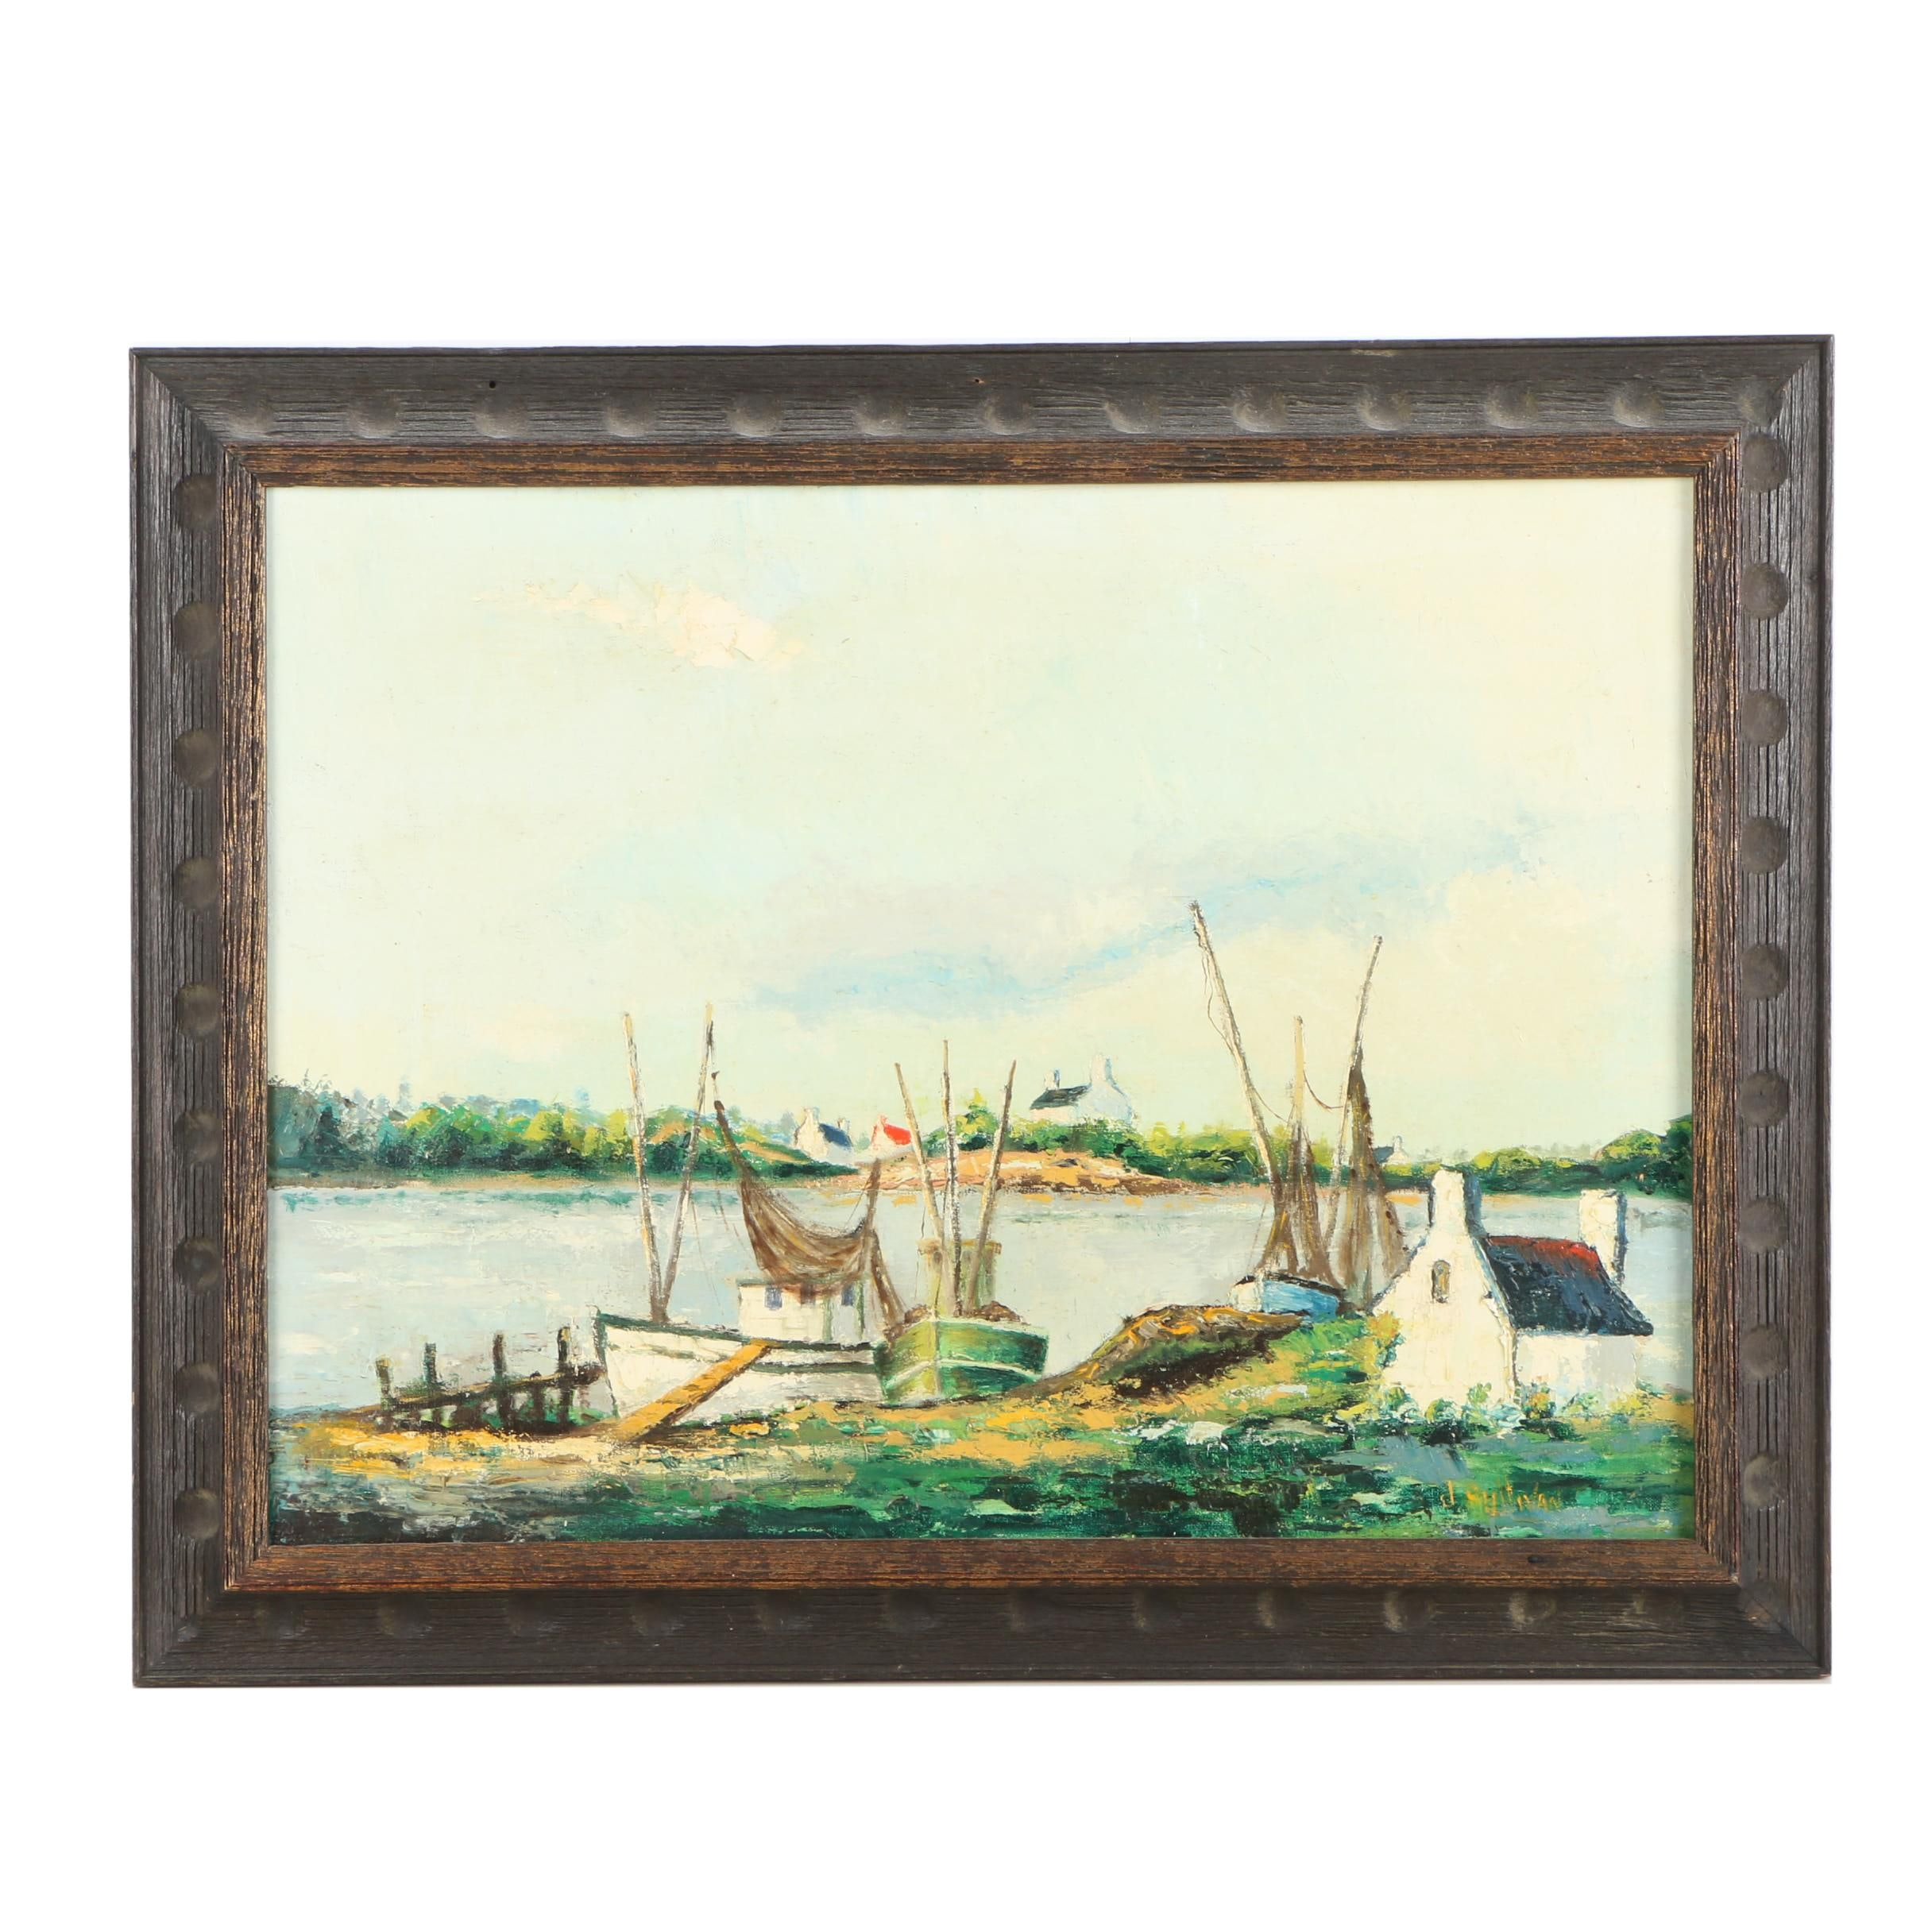 1969 J. Sullivan Oil Painting